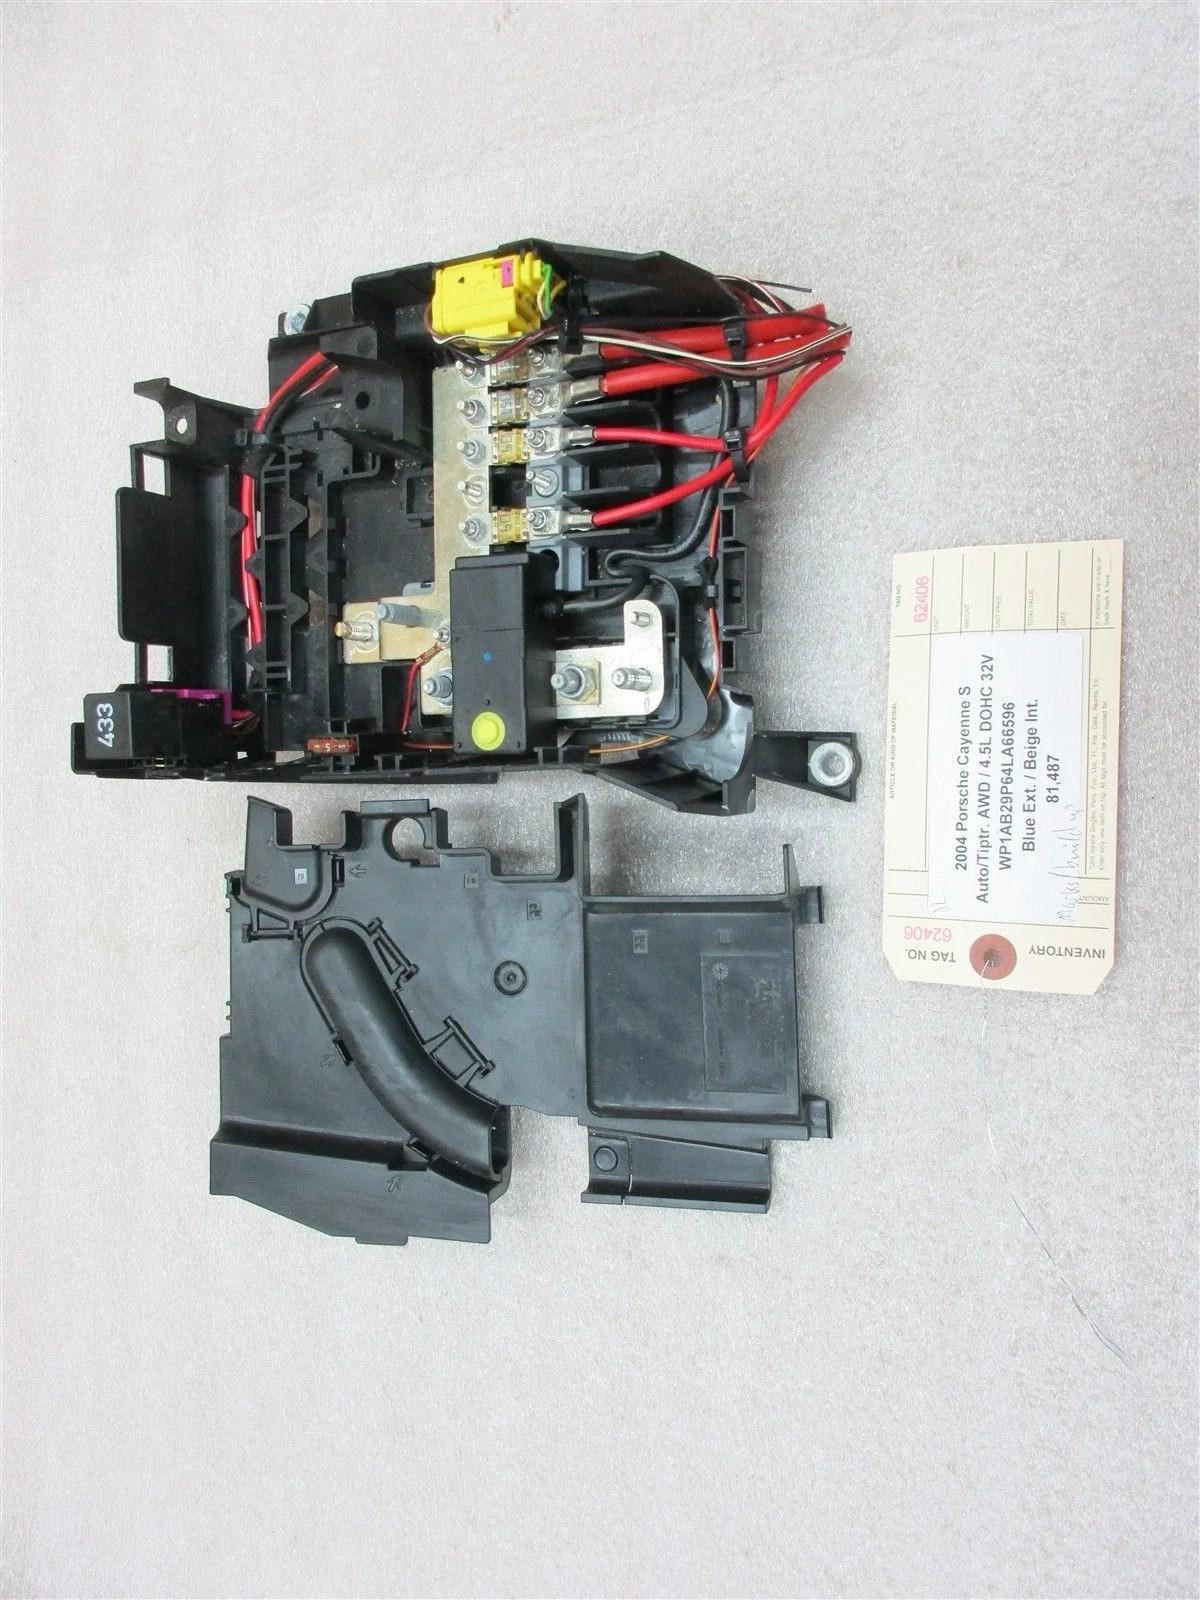 medium resolution of 04 cayenne s awd porsche 955 fuse box relay 7l0937548a 7l0937555 81 487